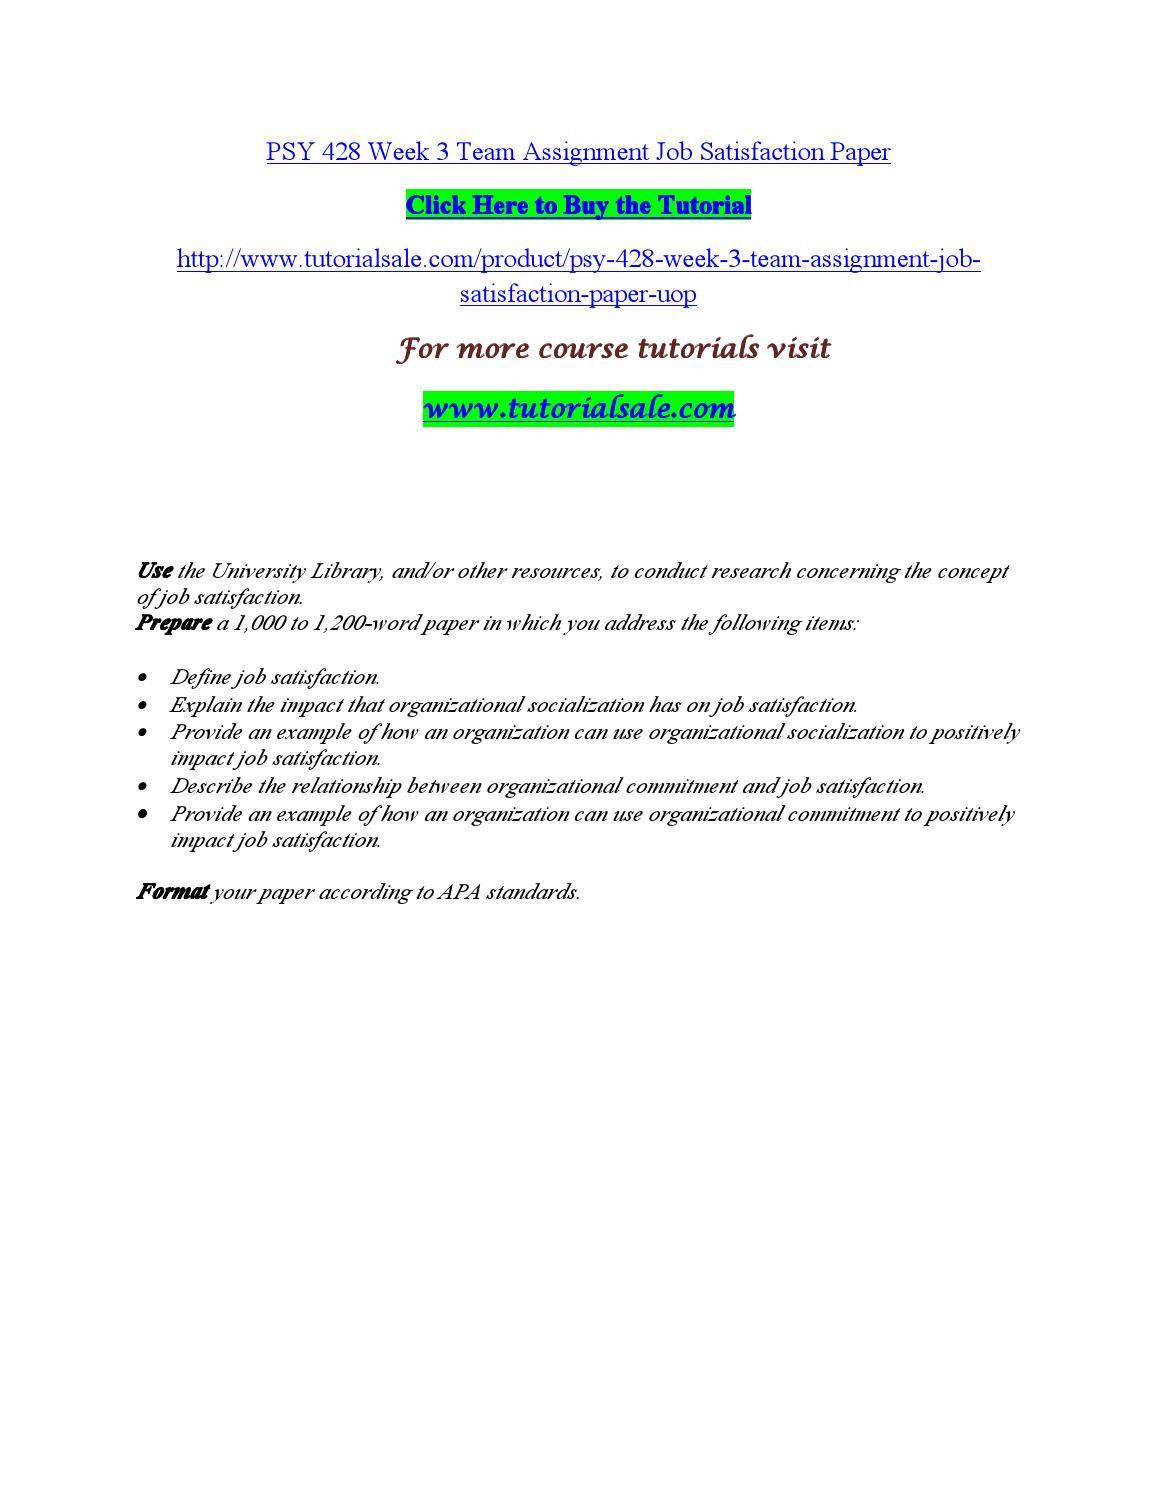 Cv writing services usa - Get Help